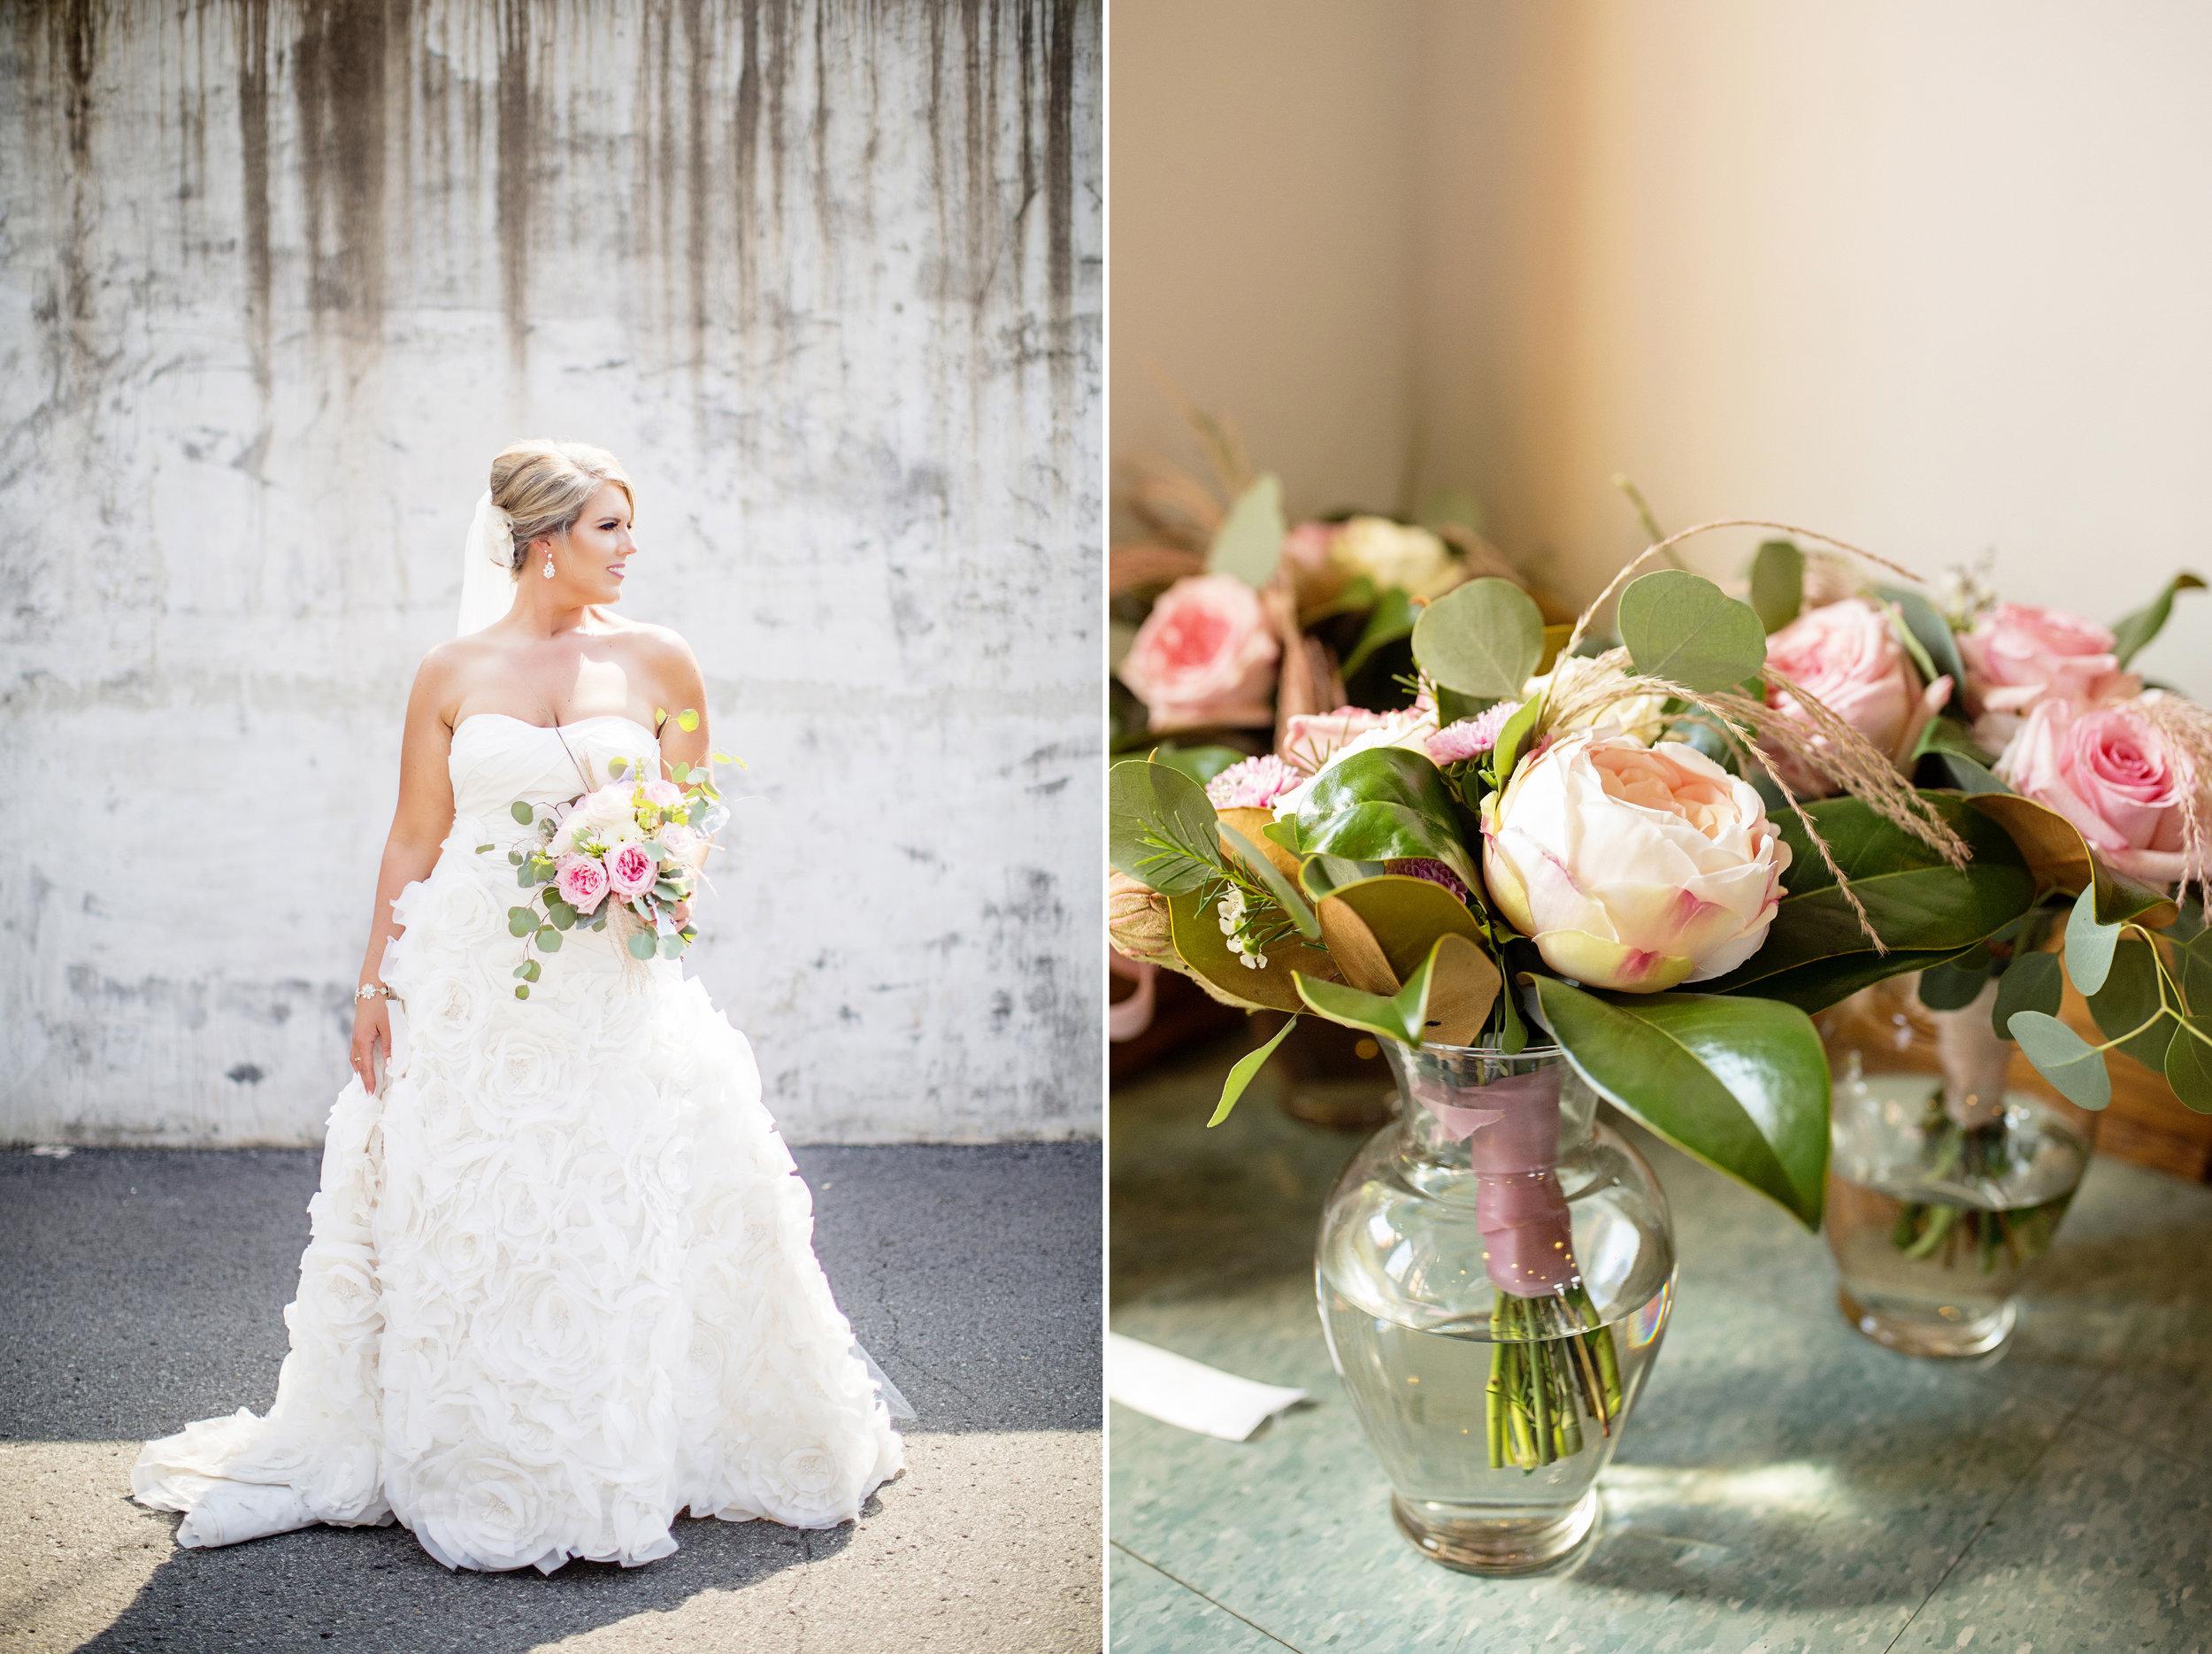 Seriously_Sabrina_Photography_Ashland_Kentucky_Train_Depot_Wedding_Parsons25.jpg